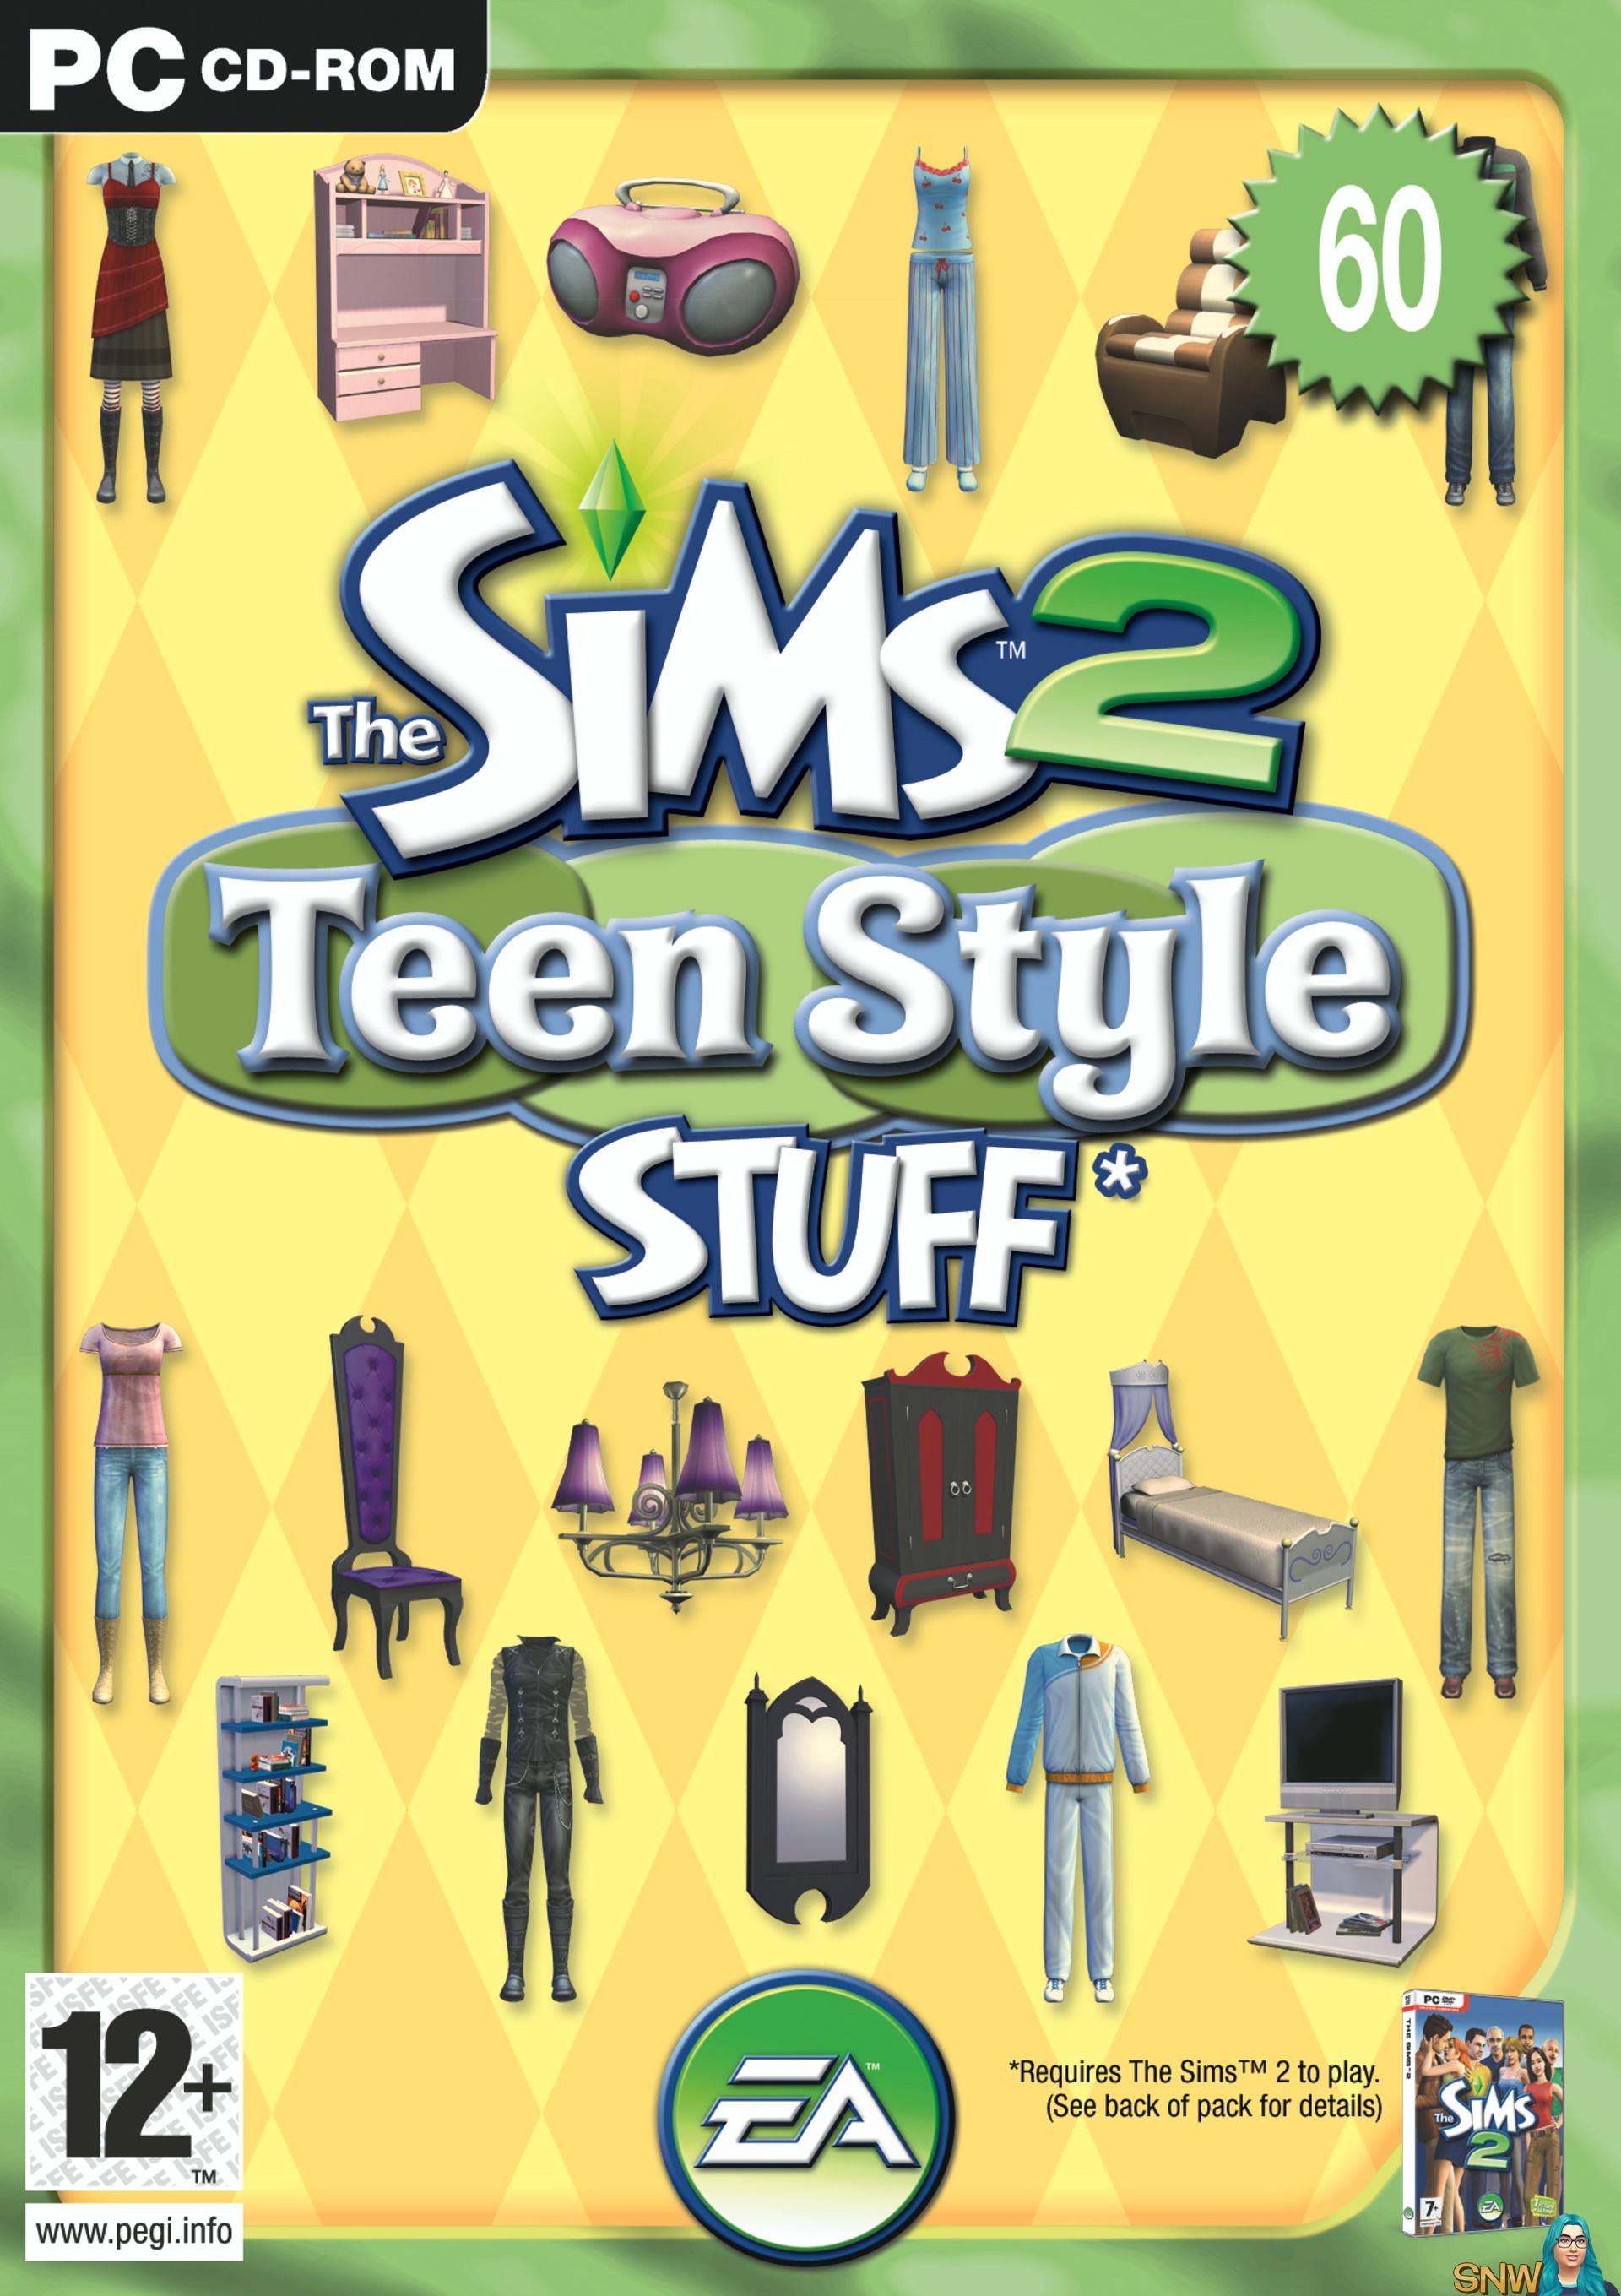 Sims 2 sex stuff adult pic